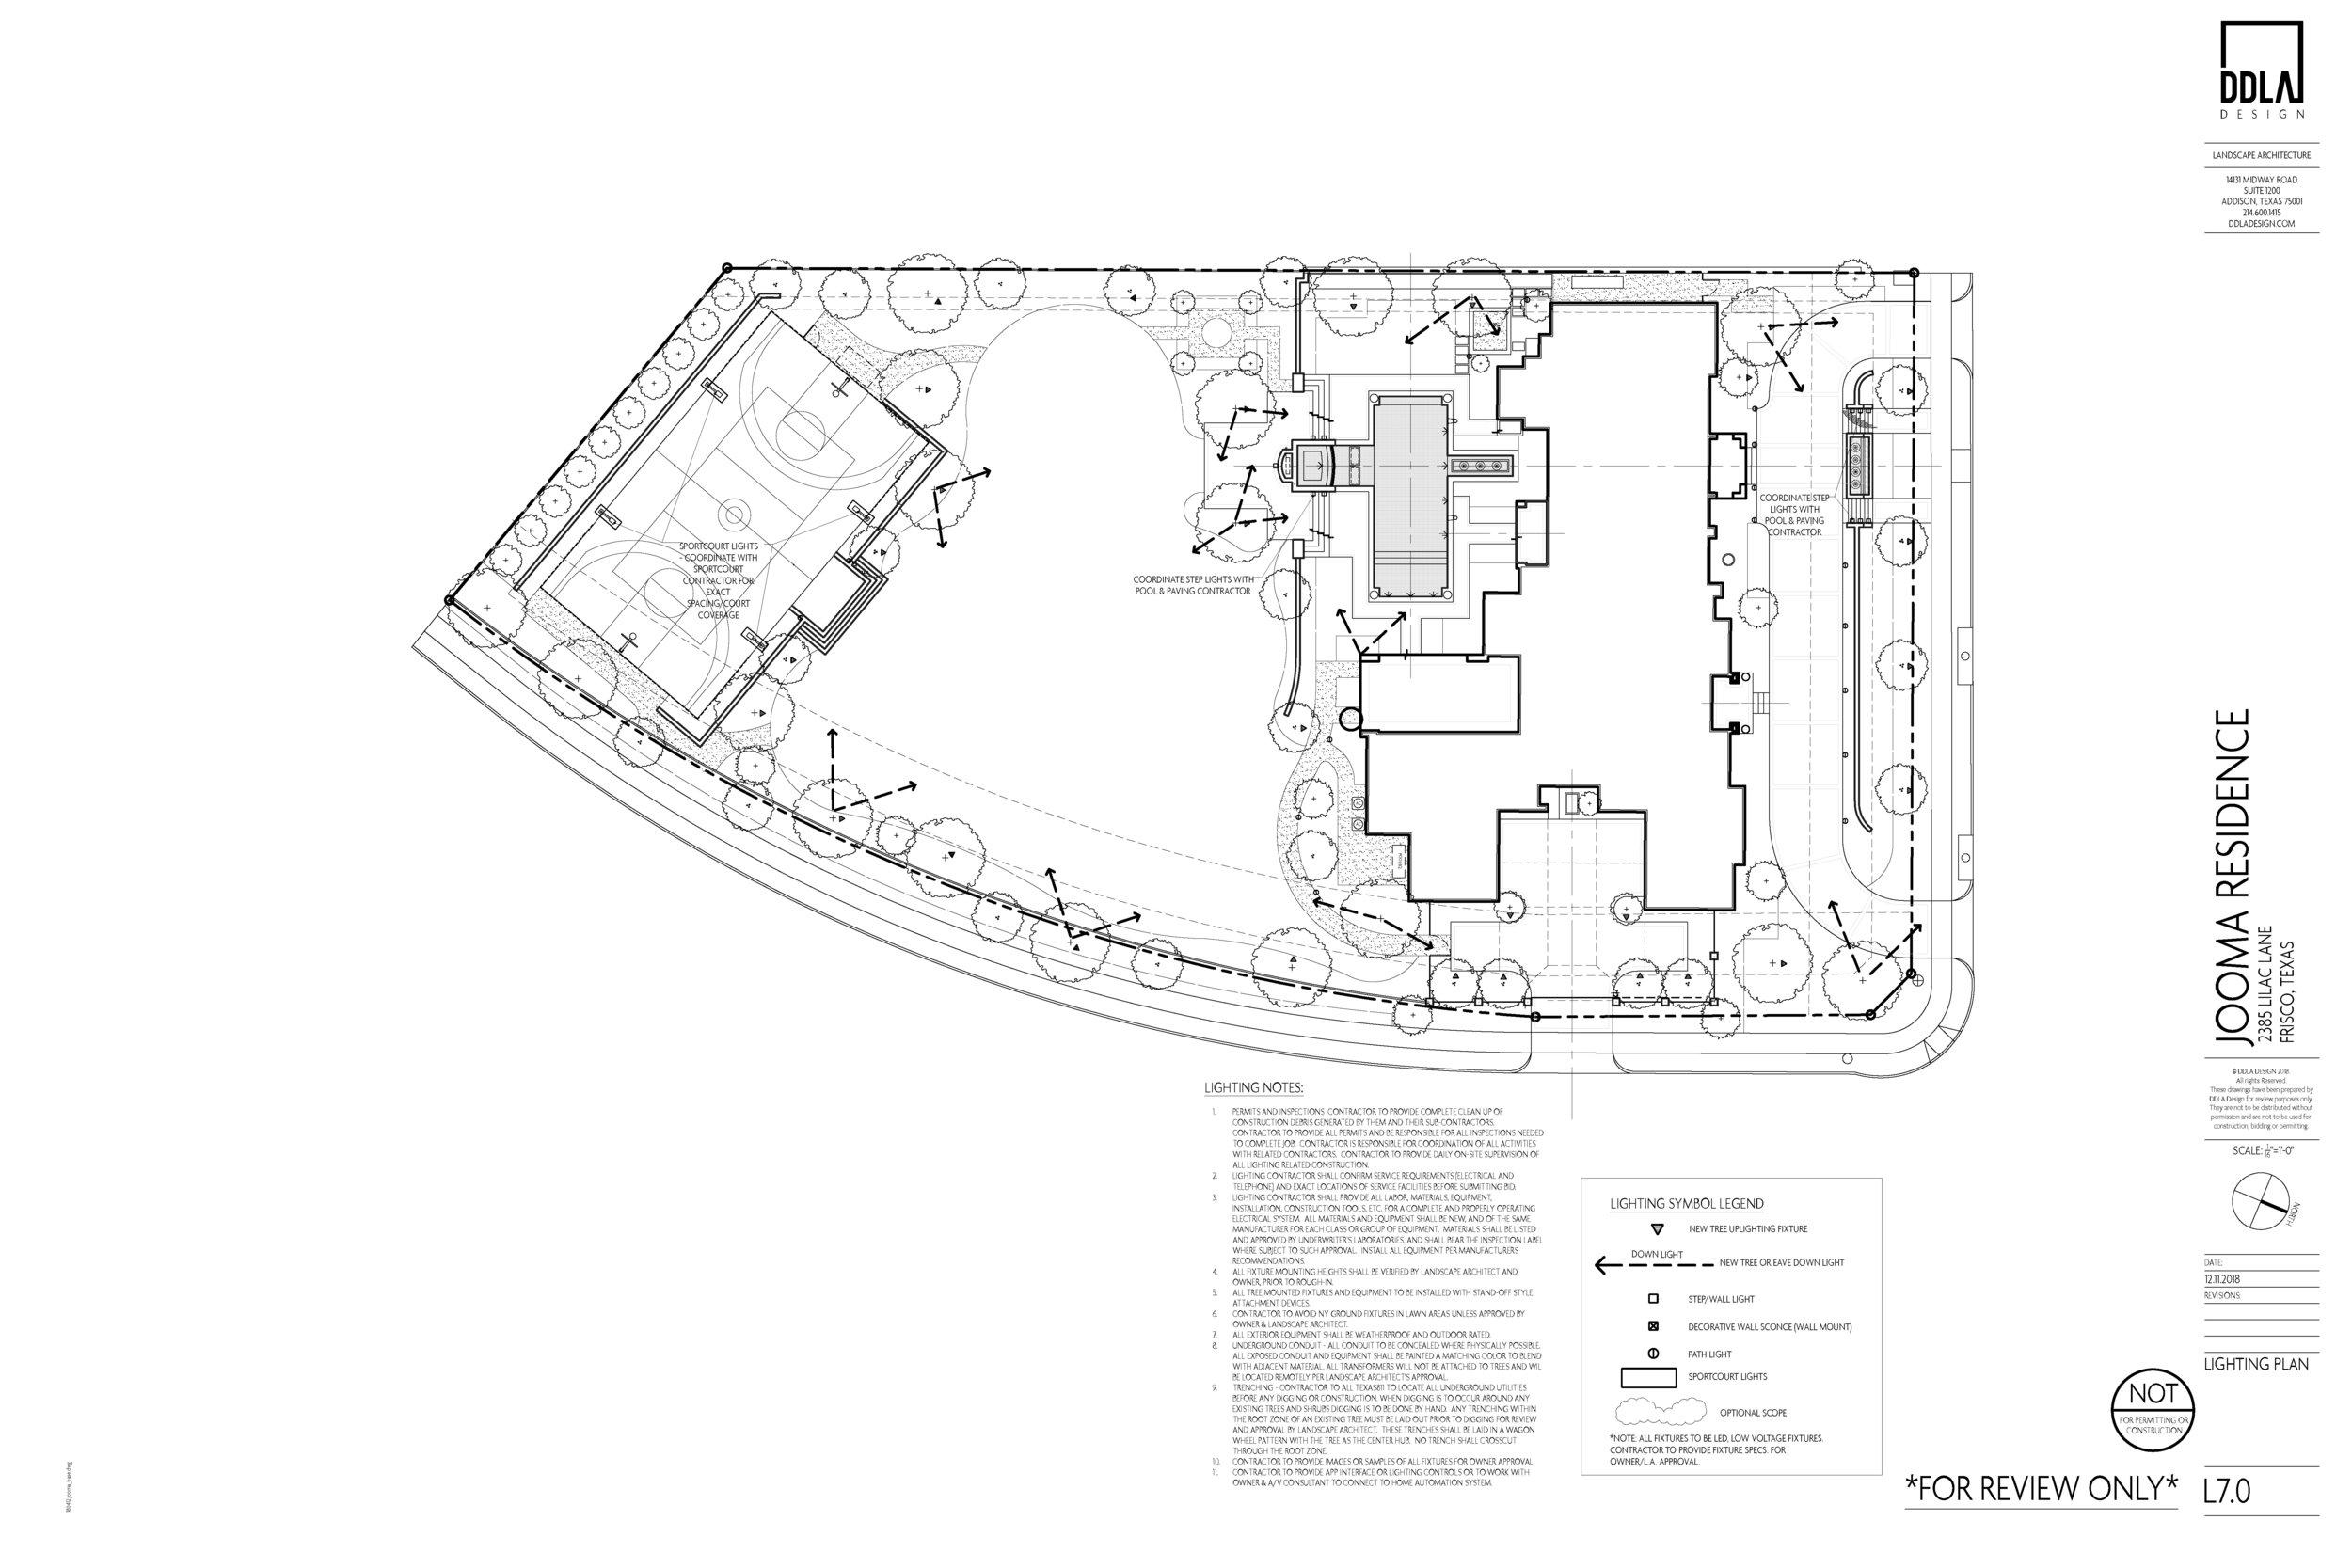 181211 jooma_final drawing package (owner)_Page_10.jpg